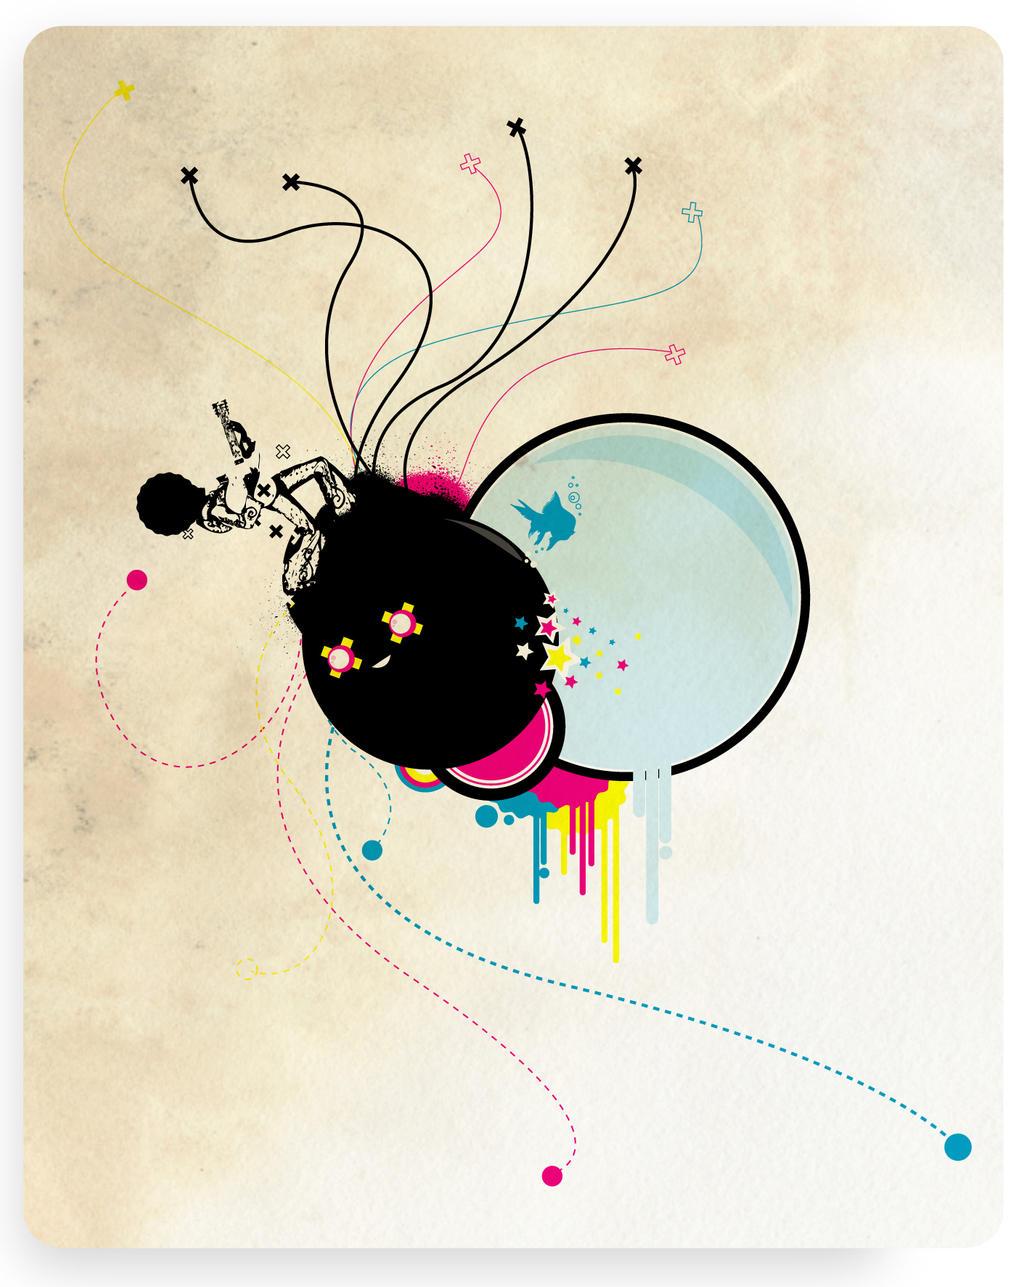 Psychedelic Bomb by cabezadecondor